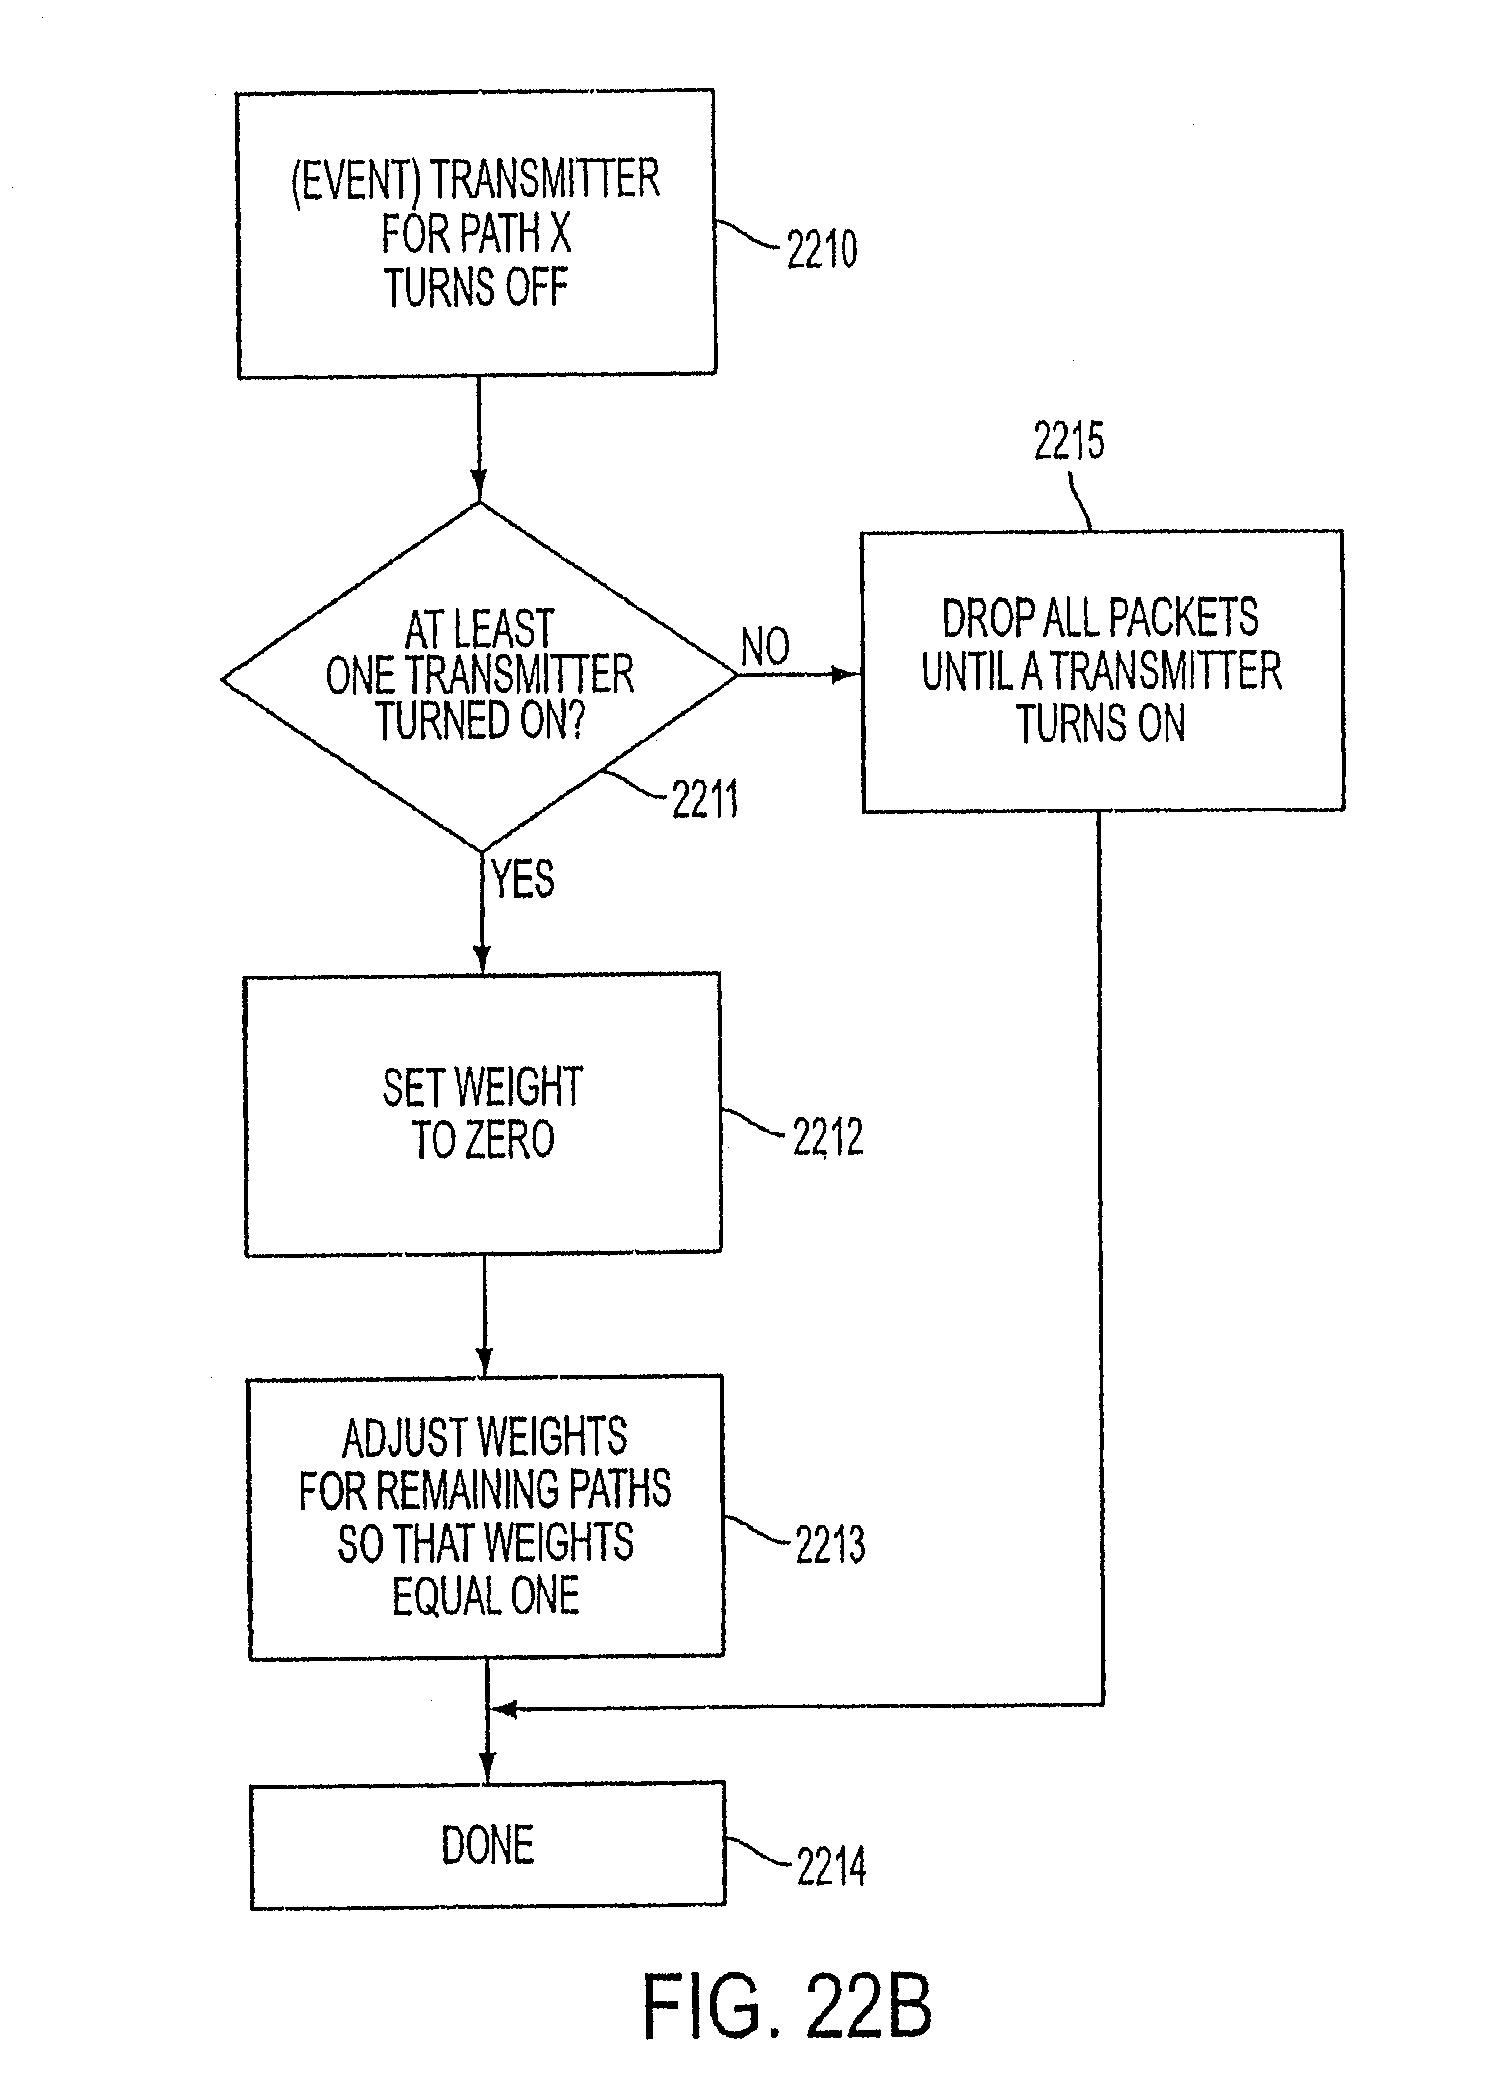 acap resume builder glenn patent drawing us d patent drawing